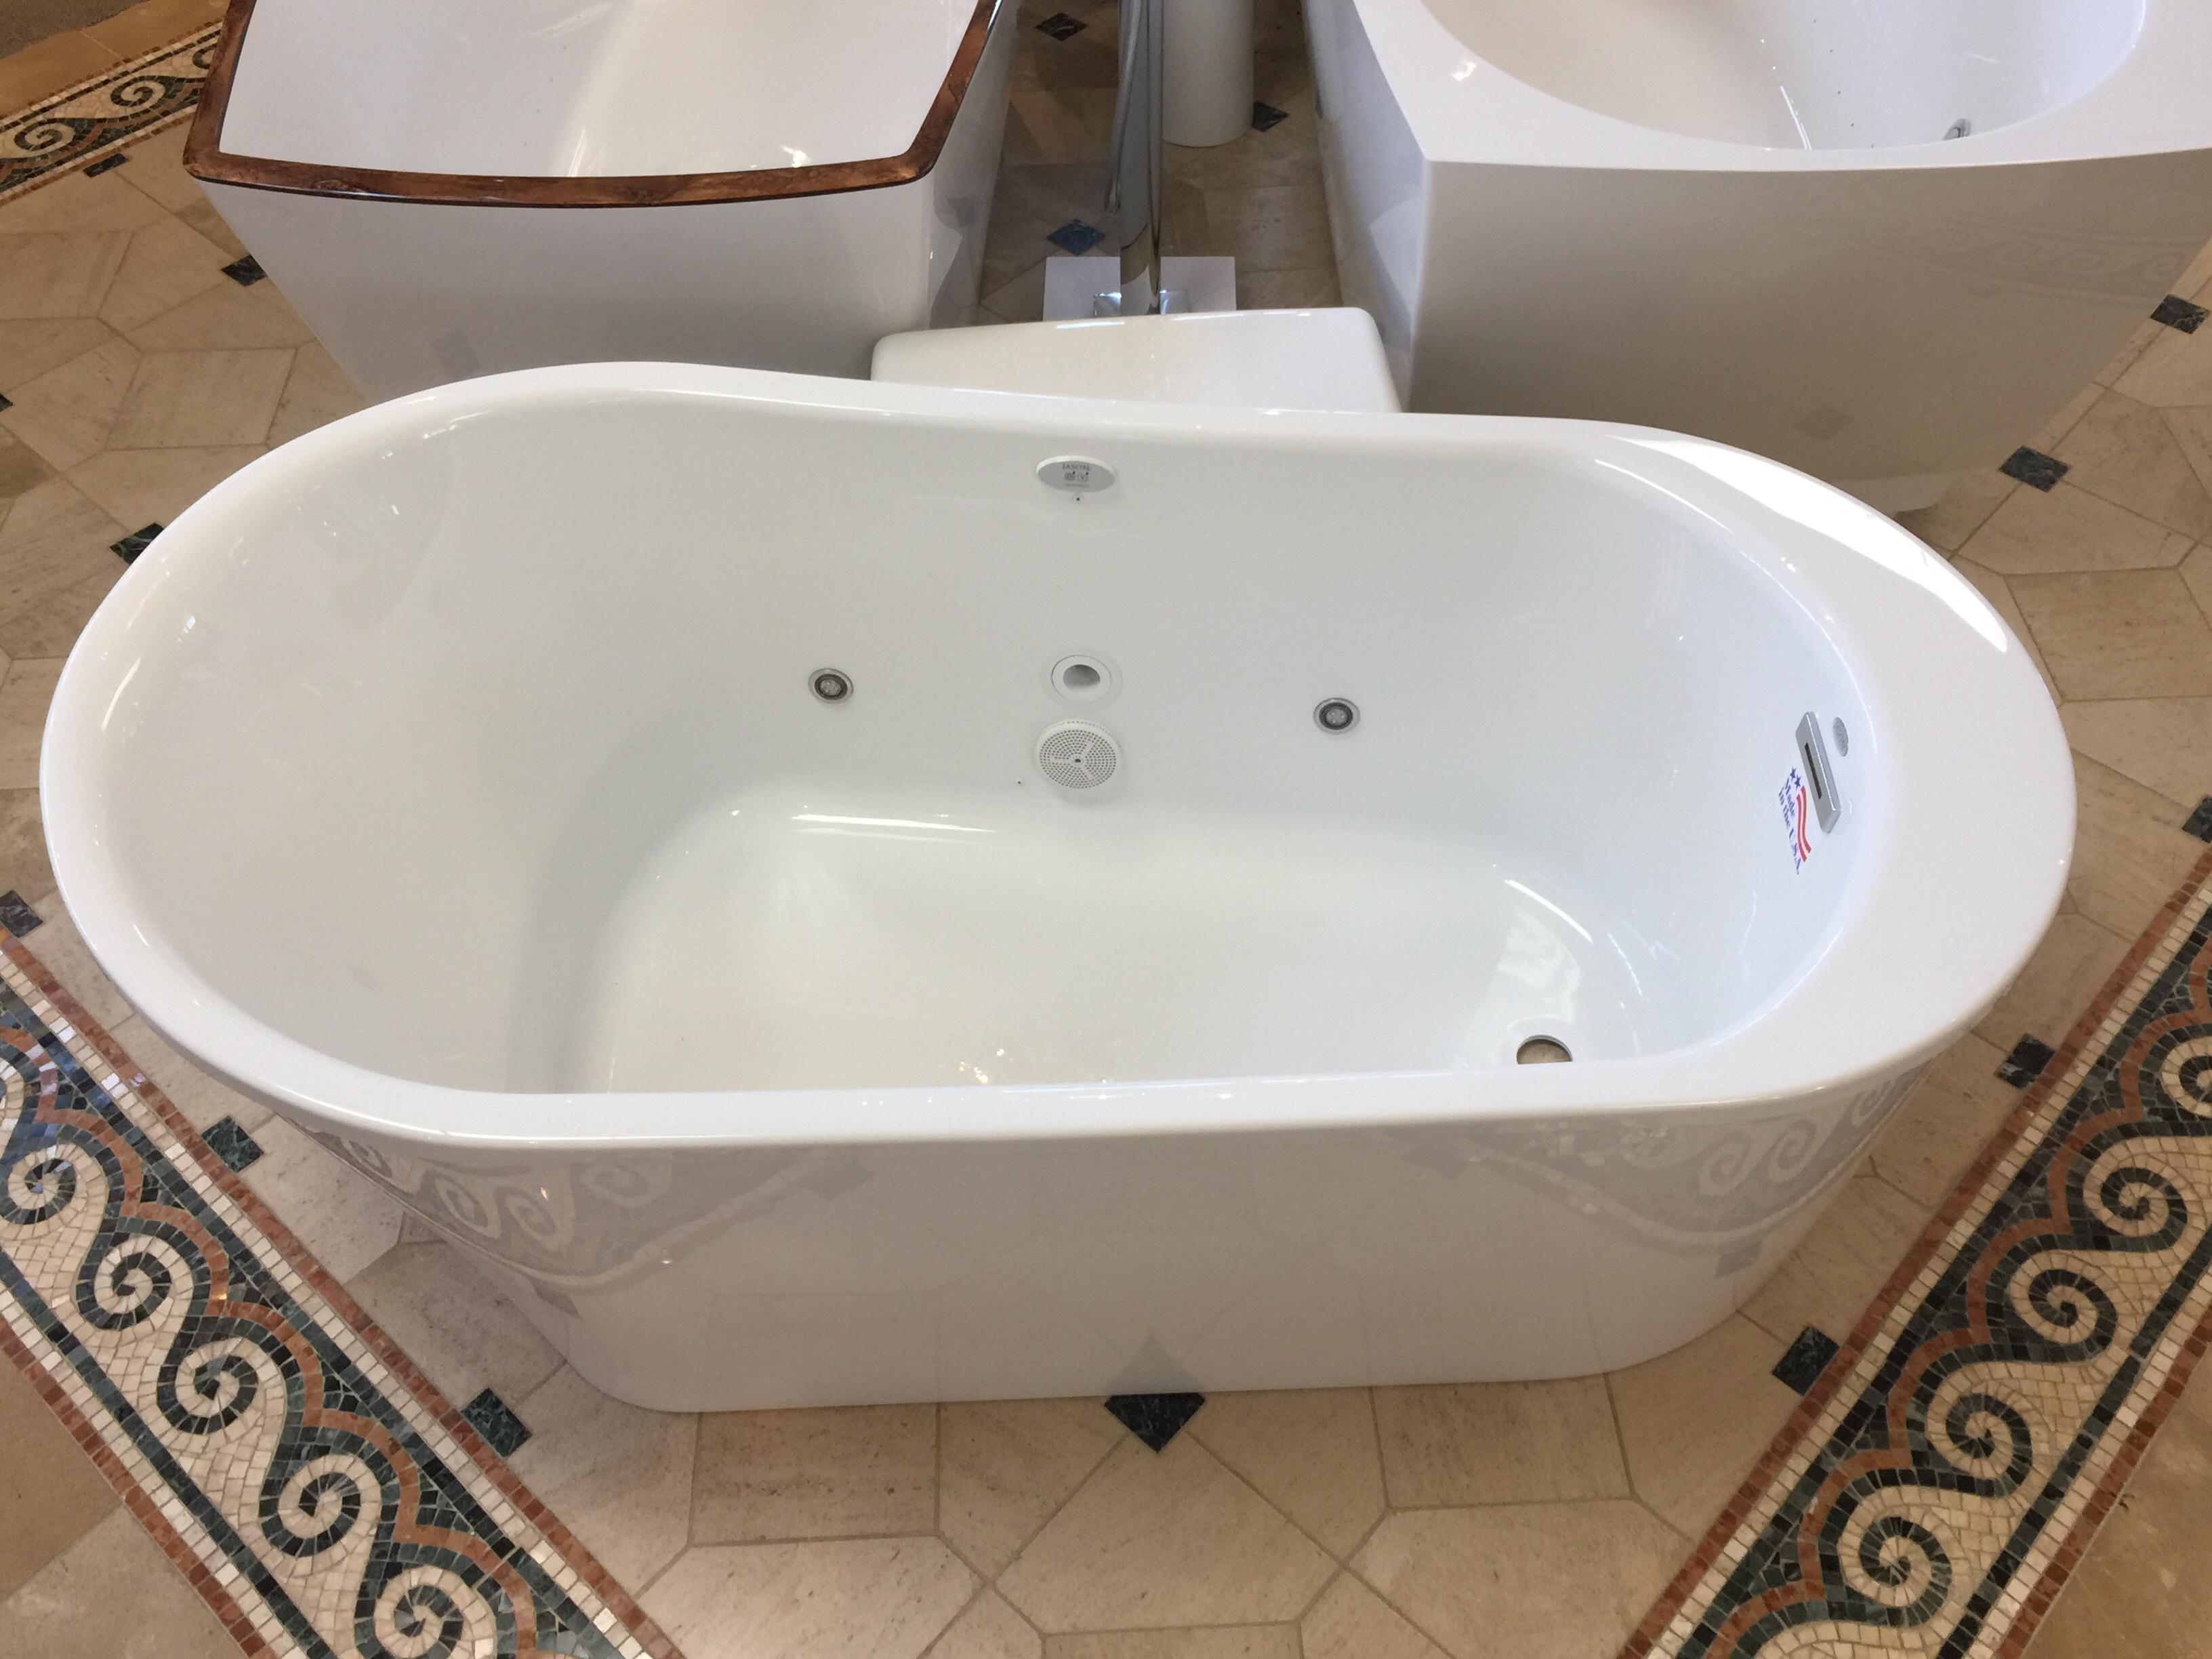 Jason Hydrotherapy Forma MicroSilk Tub – Nicklas Supply